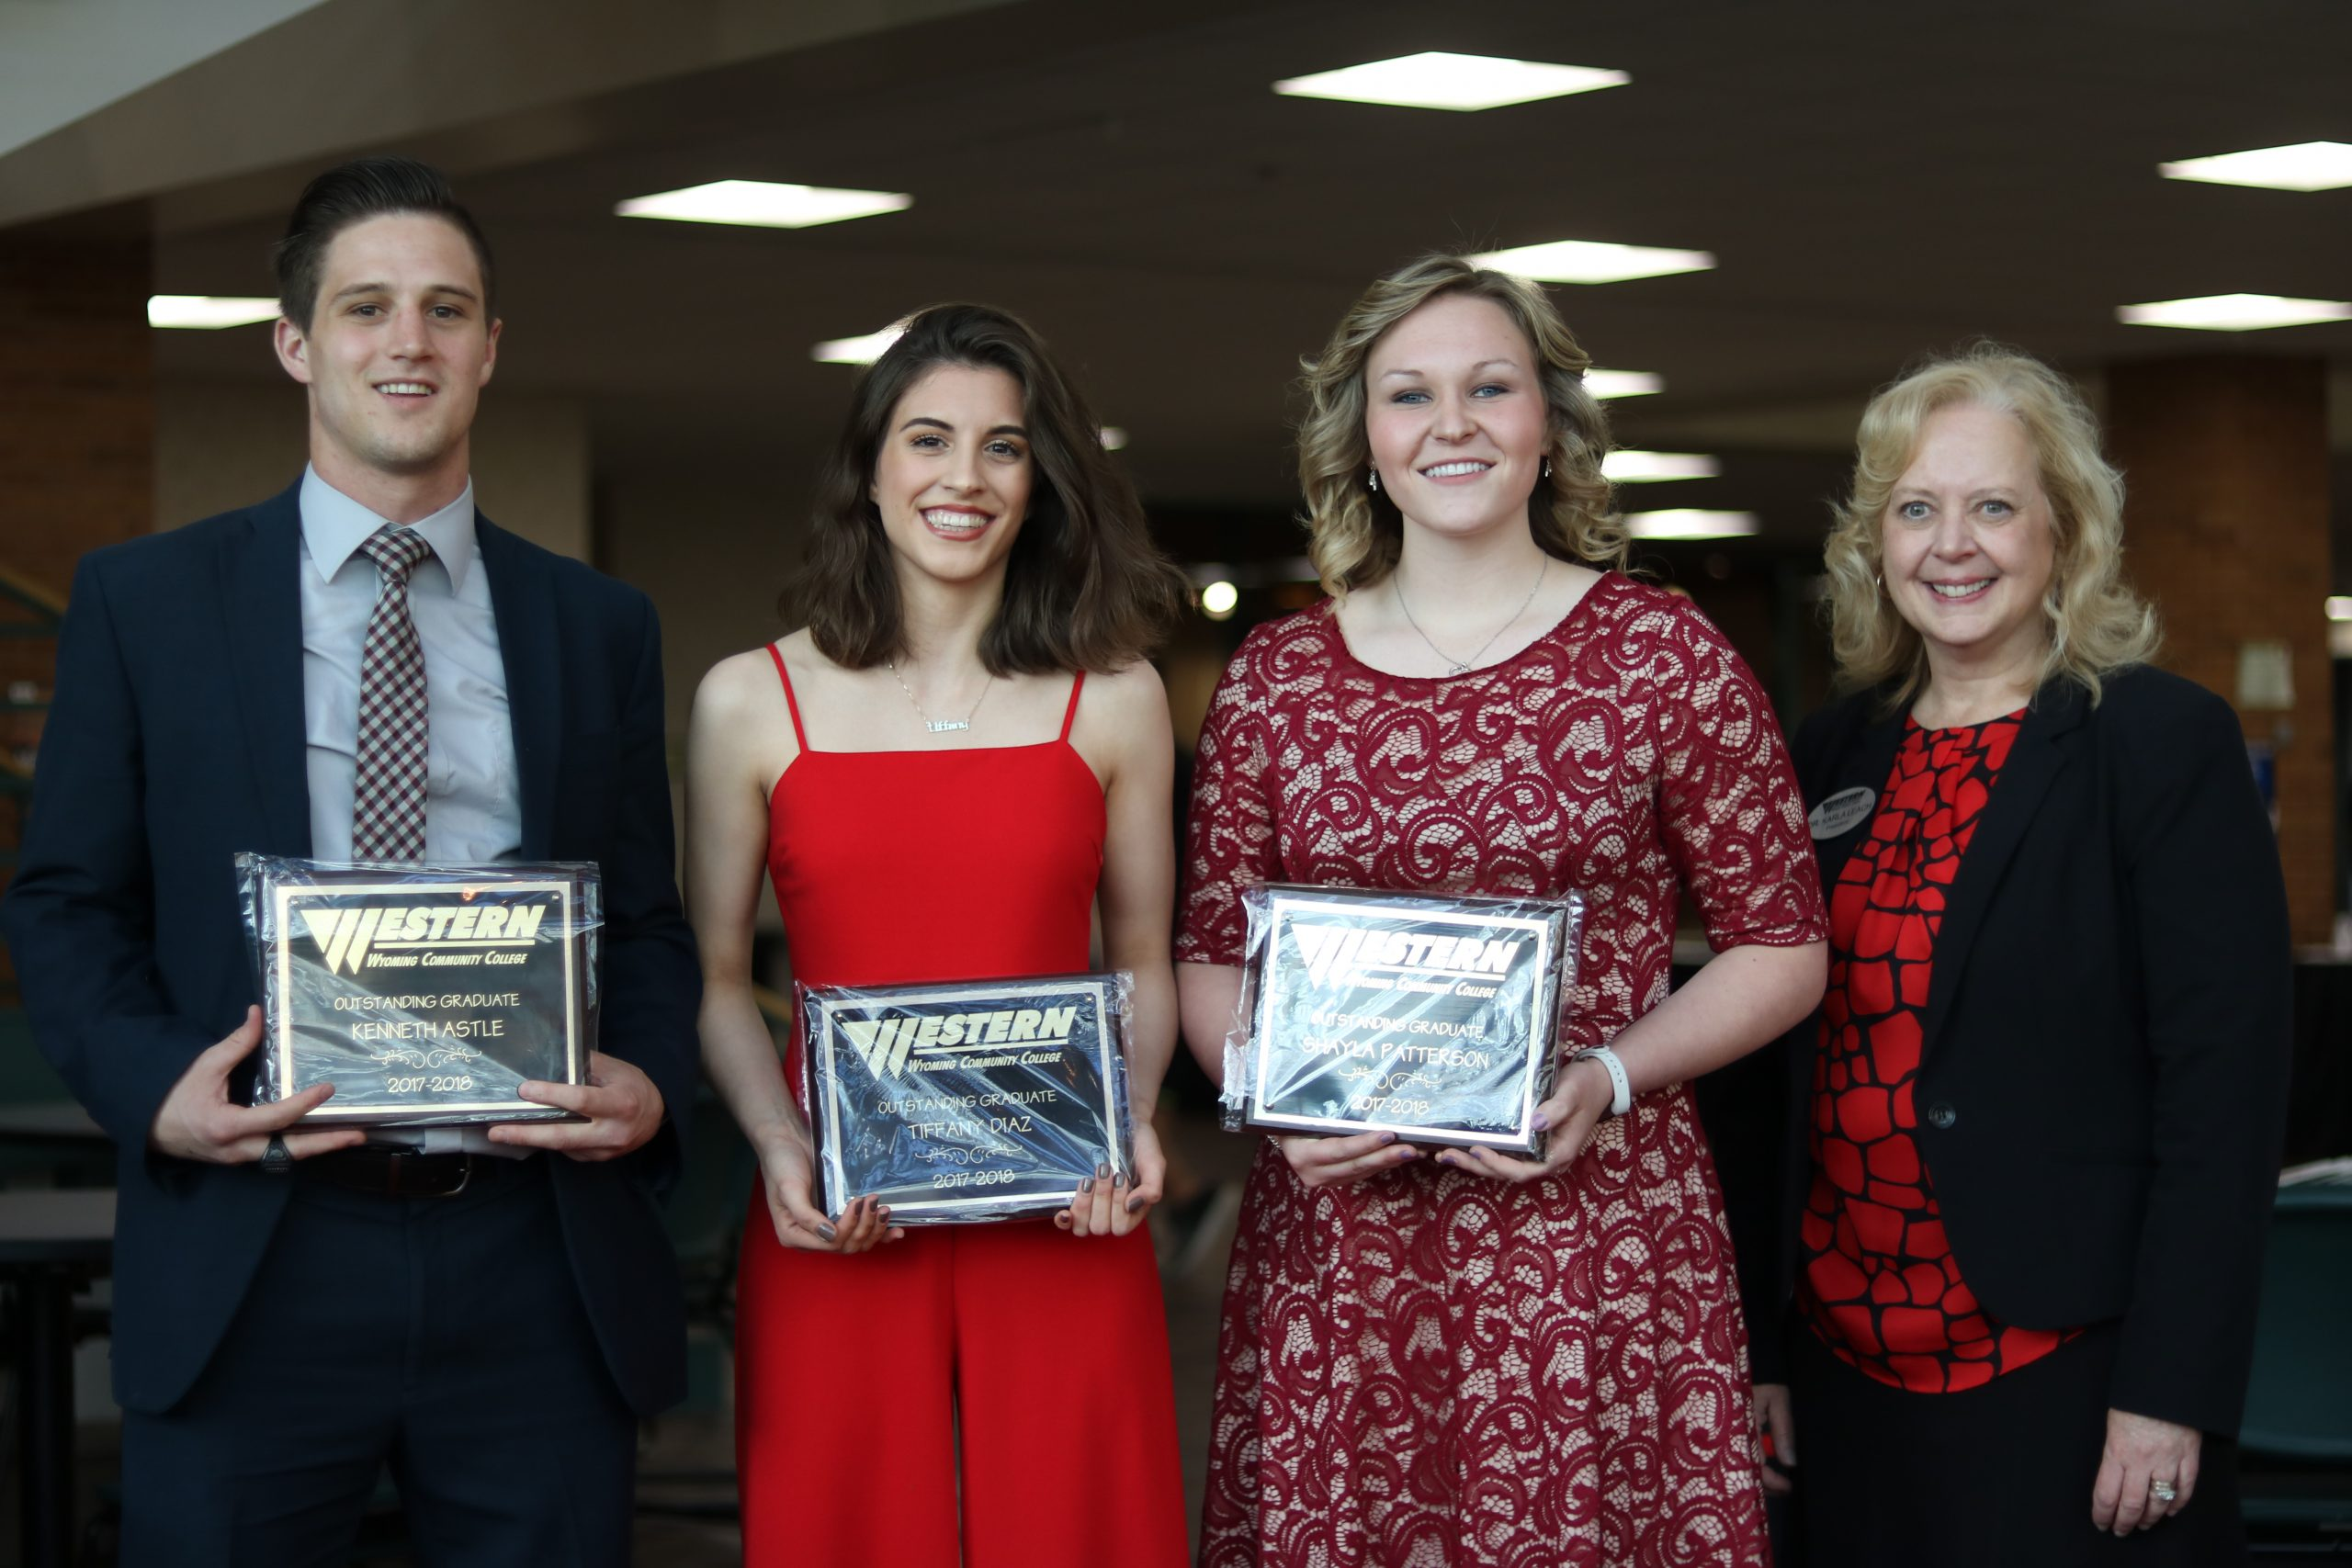 Western's 2018 Outstanding Graduates